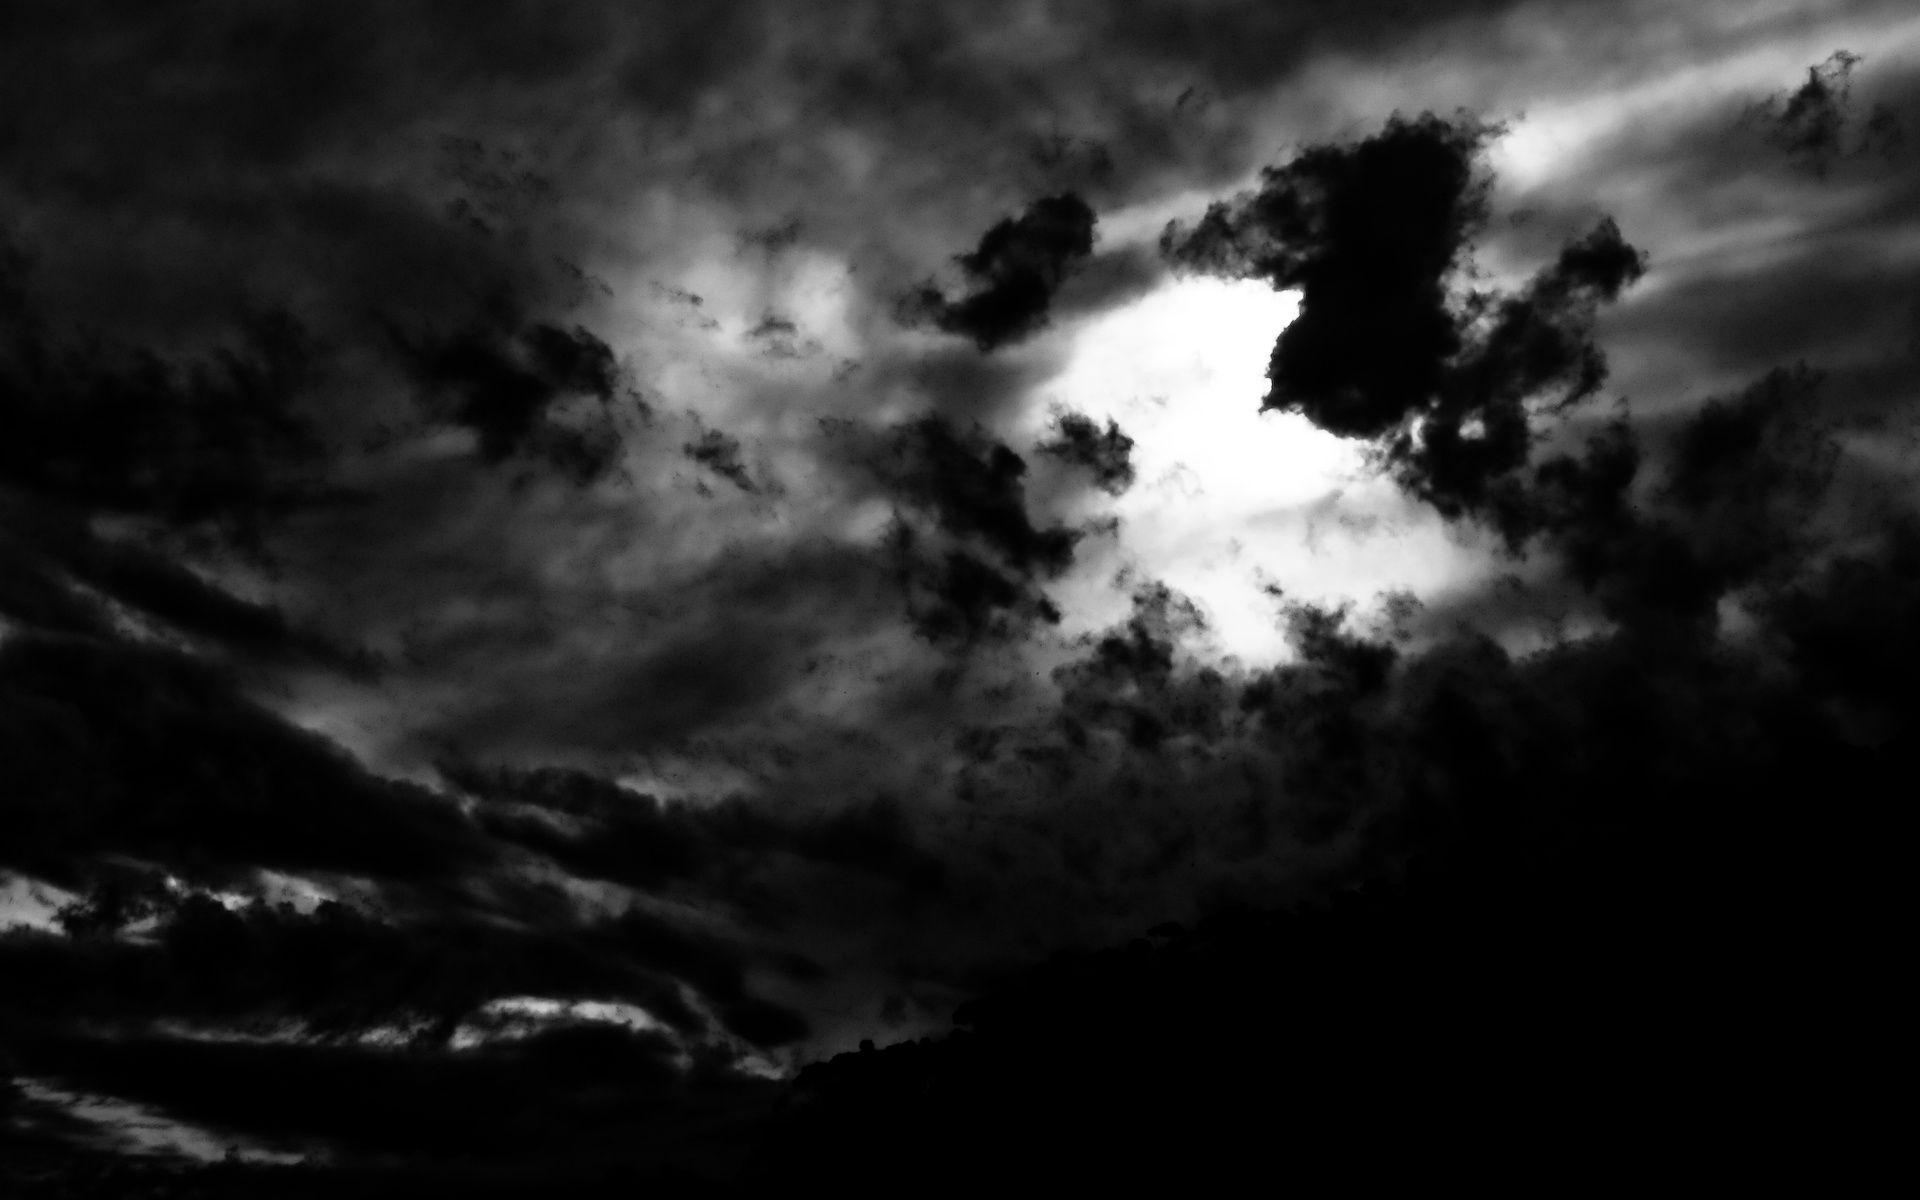 Hd wallpaper darkness - Dark Desktop Hd Wallpapers